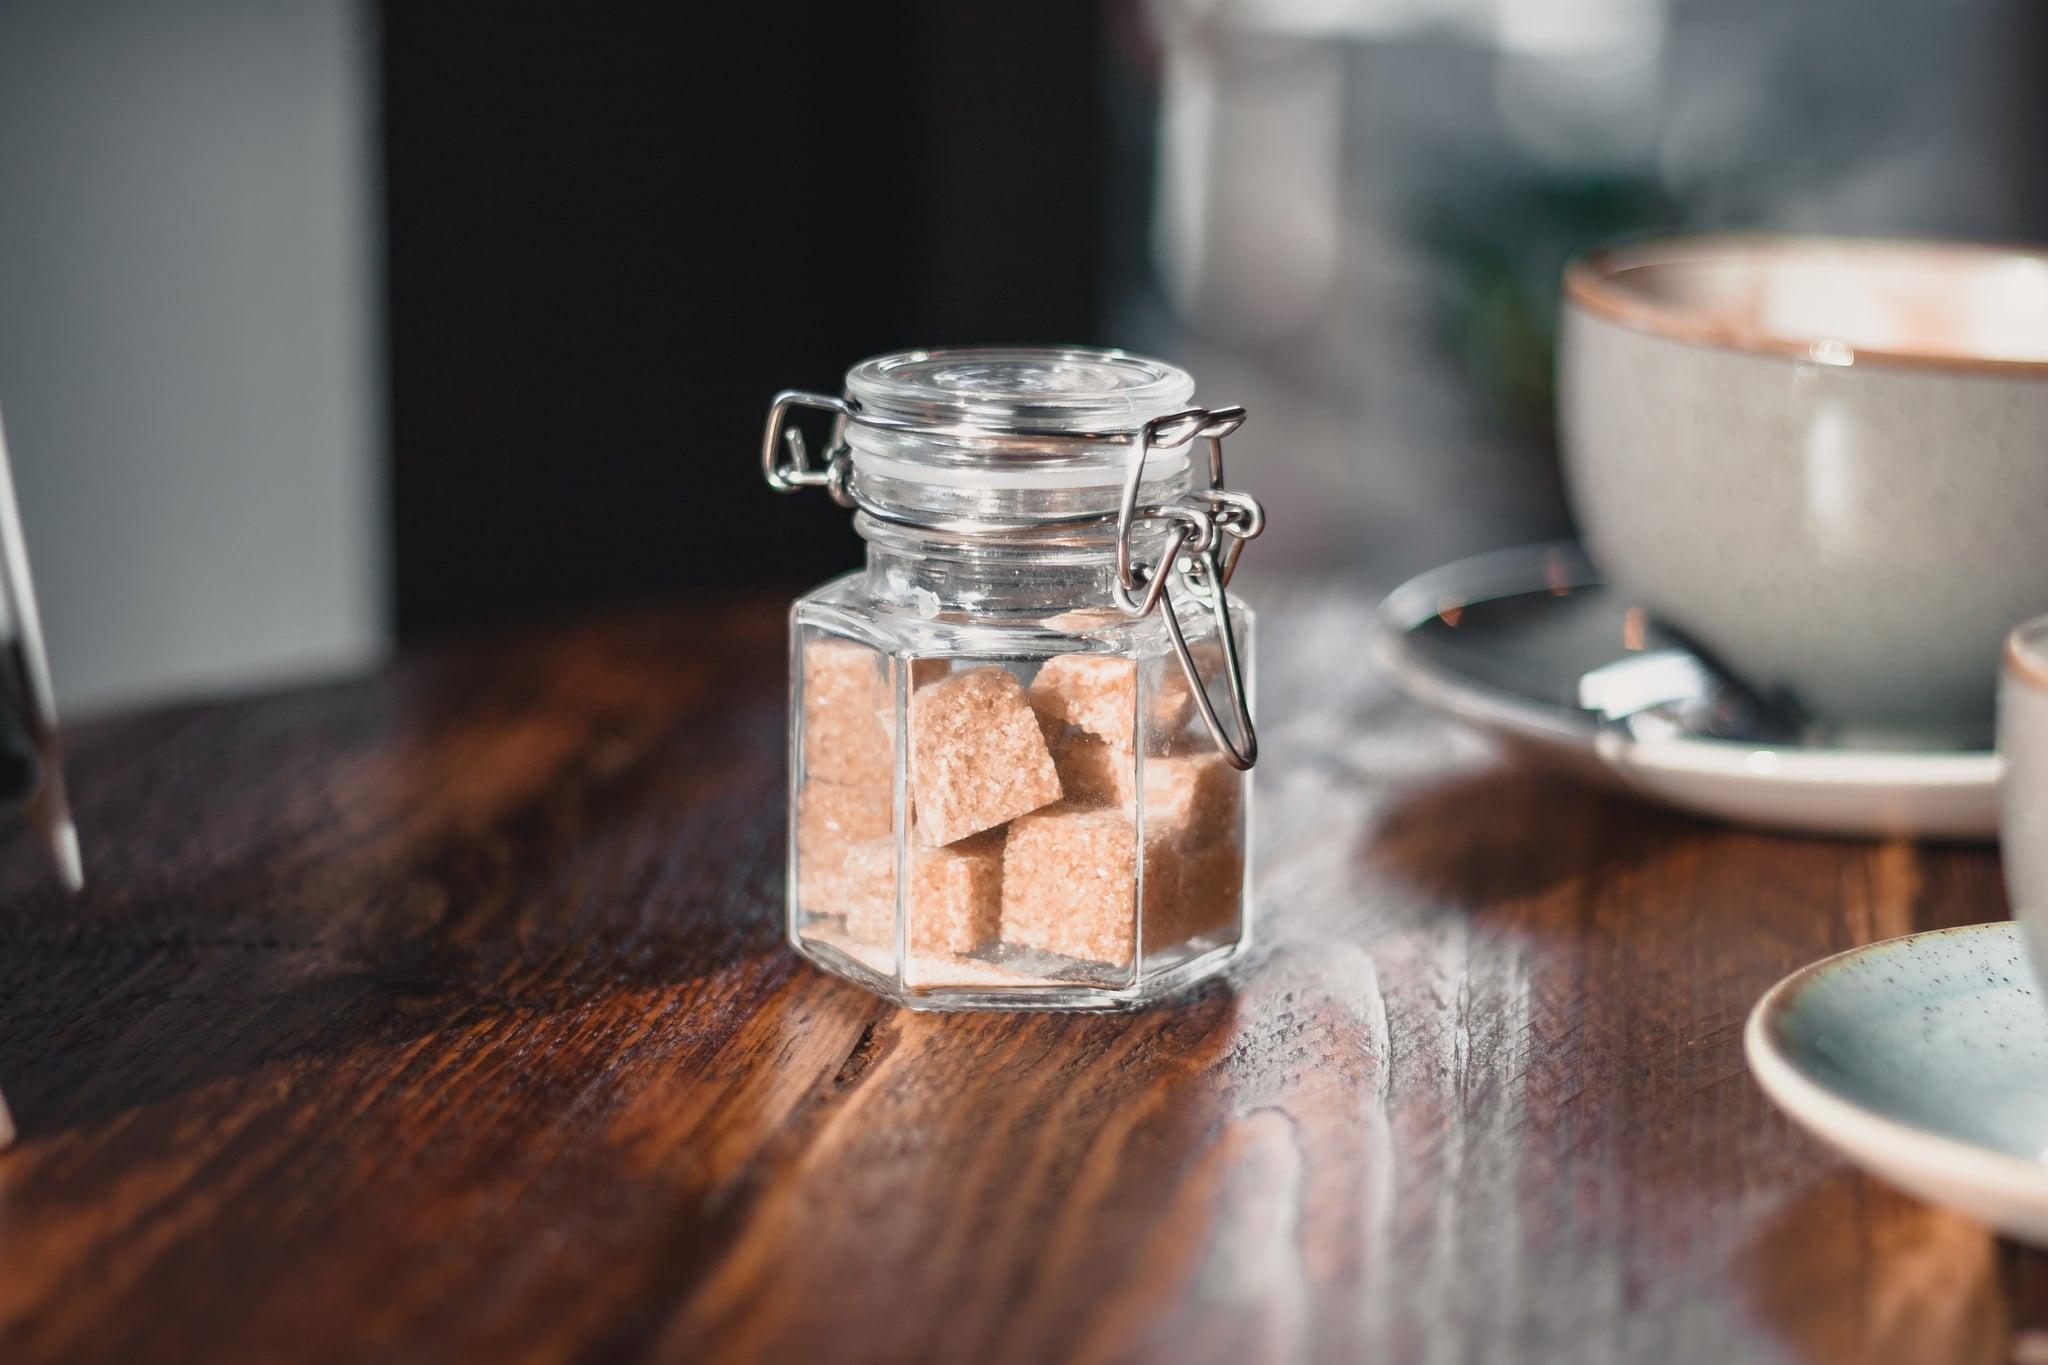 Natural sweeteners keto diet